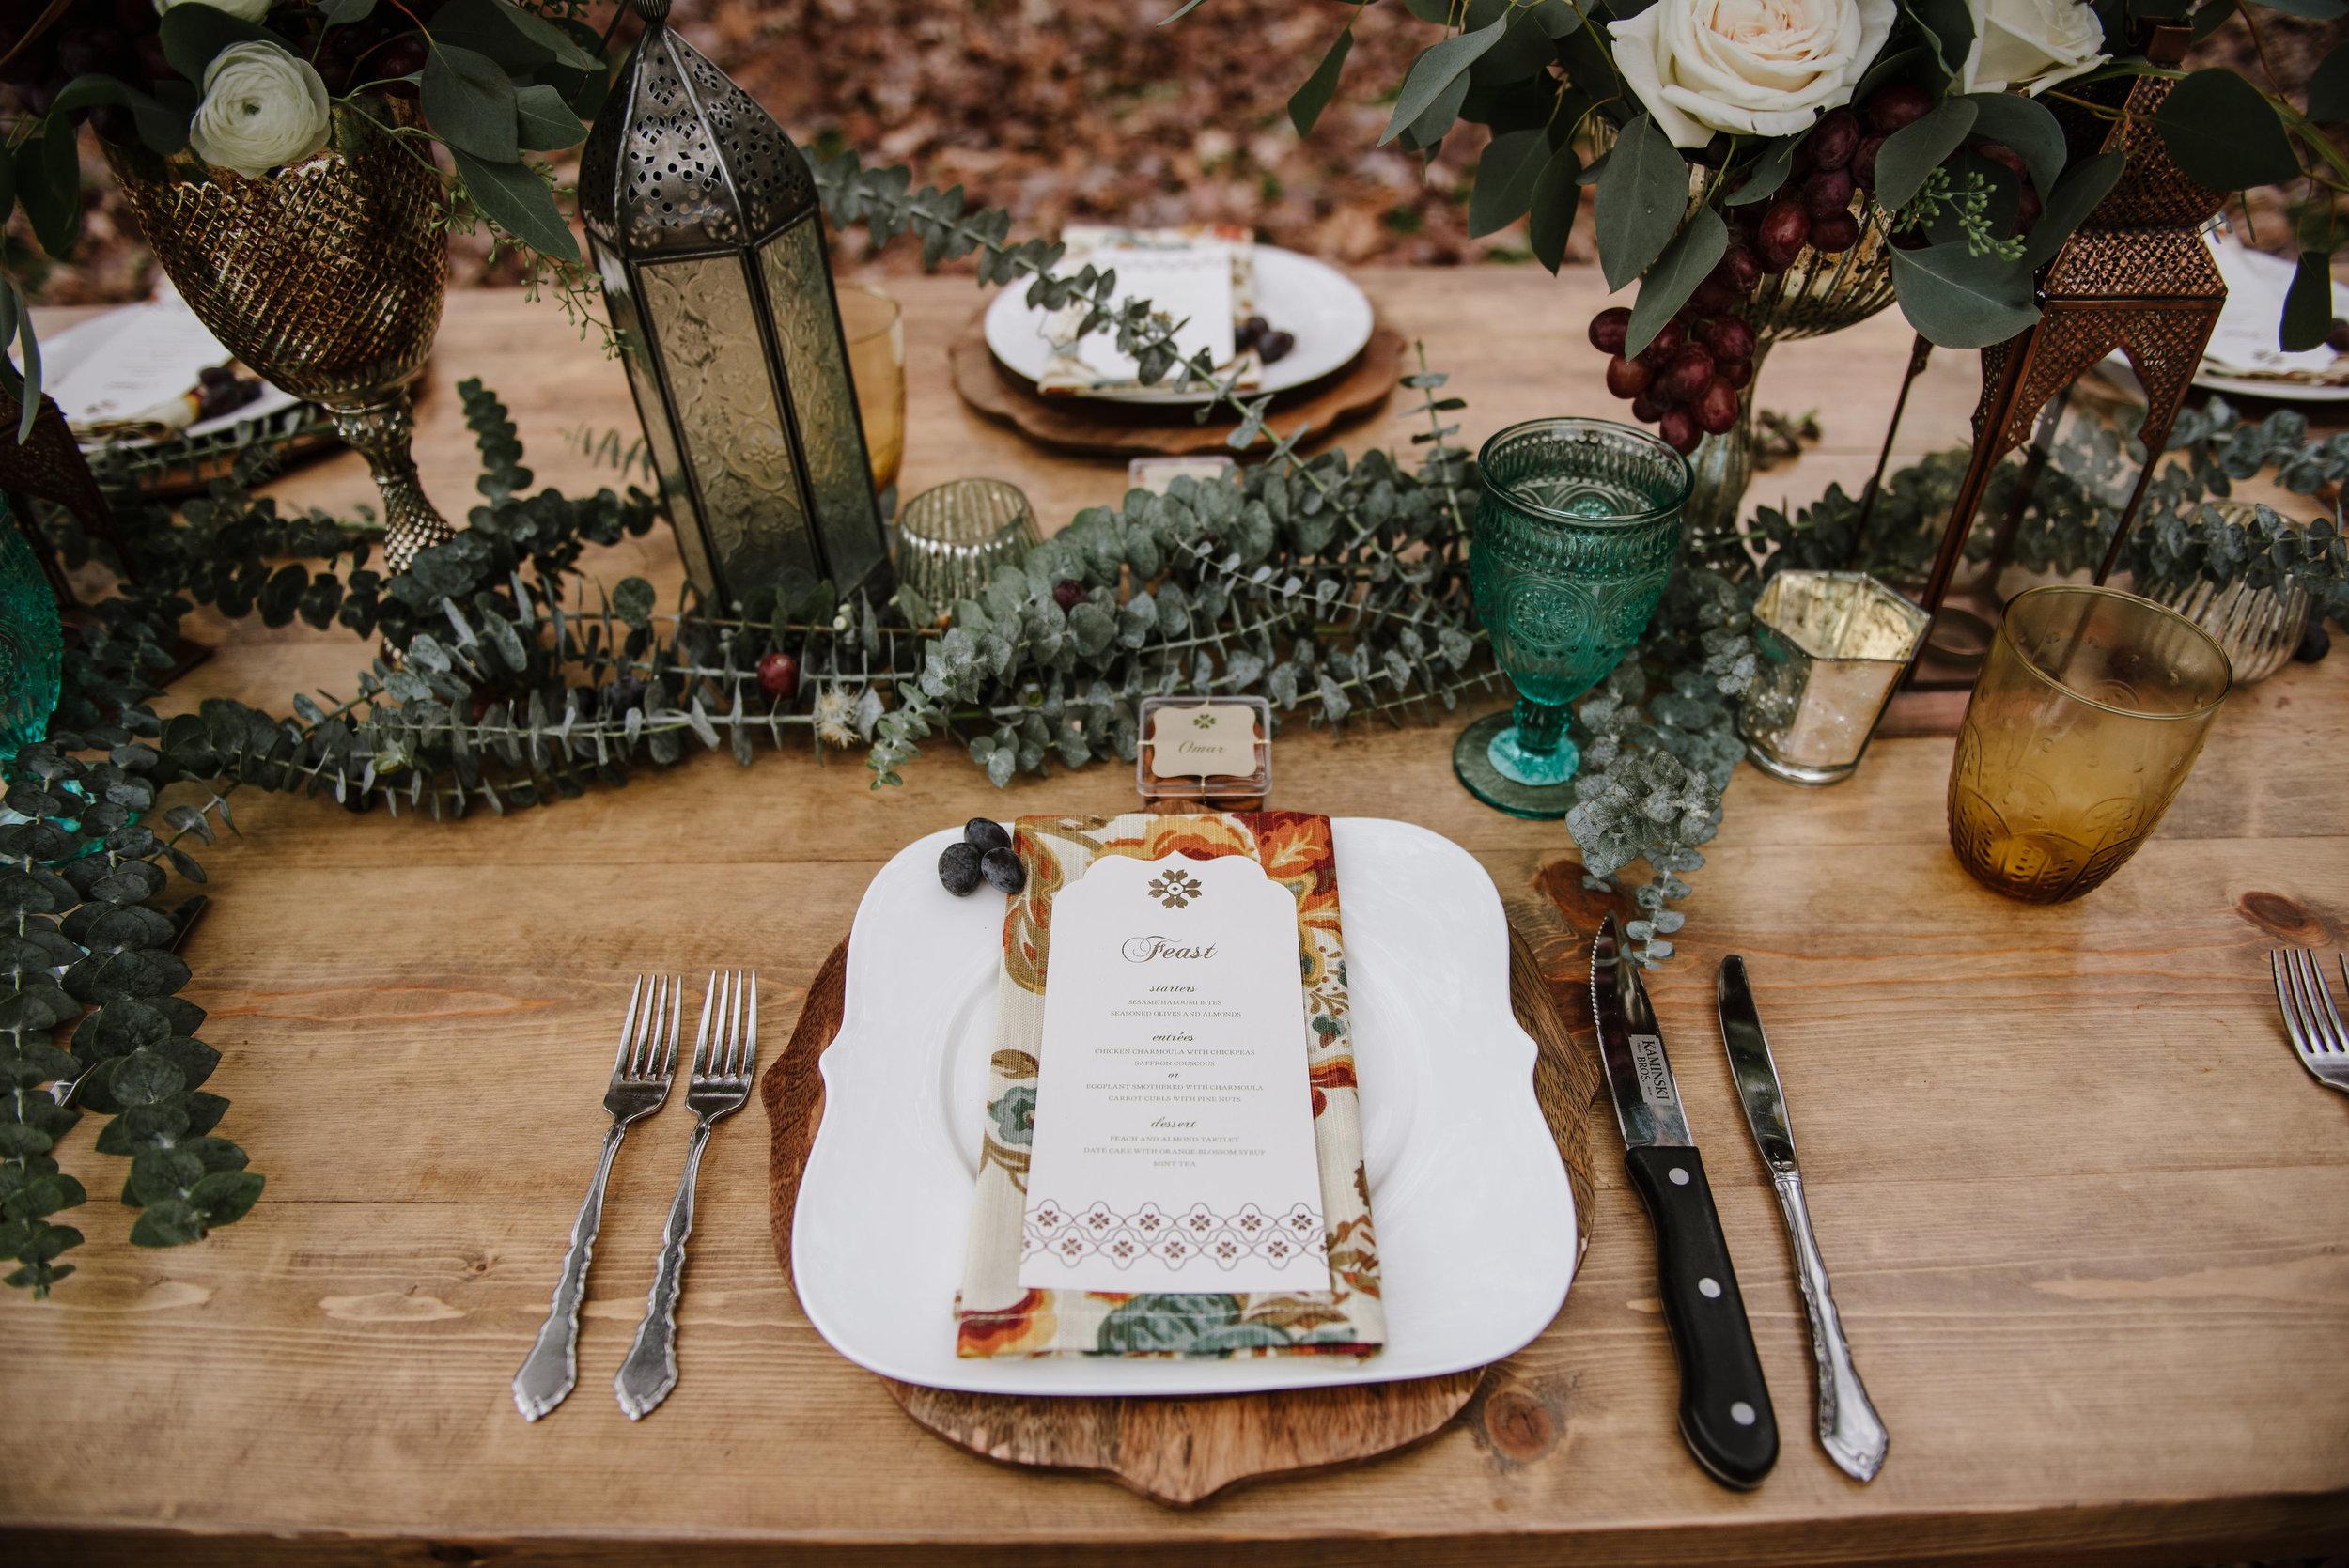 Wisconsin dells wedding planner Chula vista resort